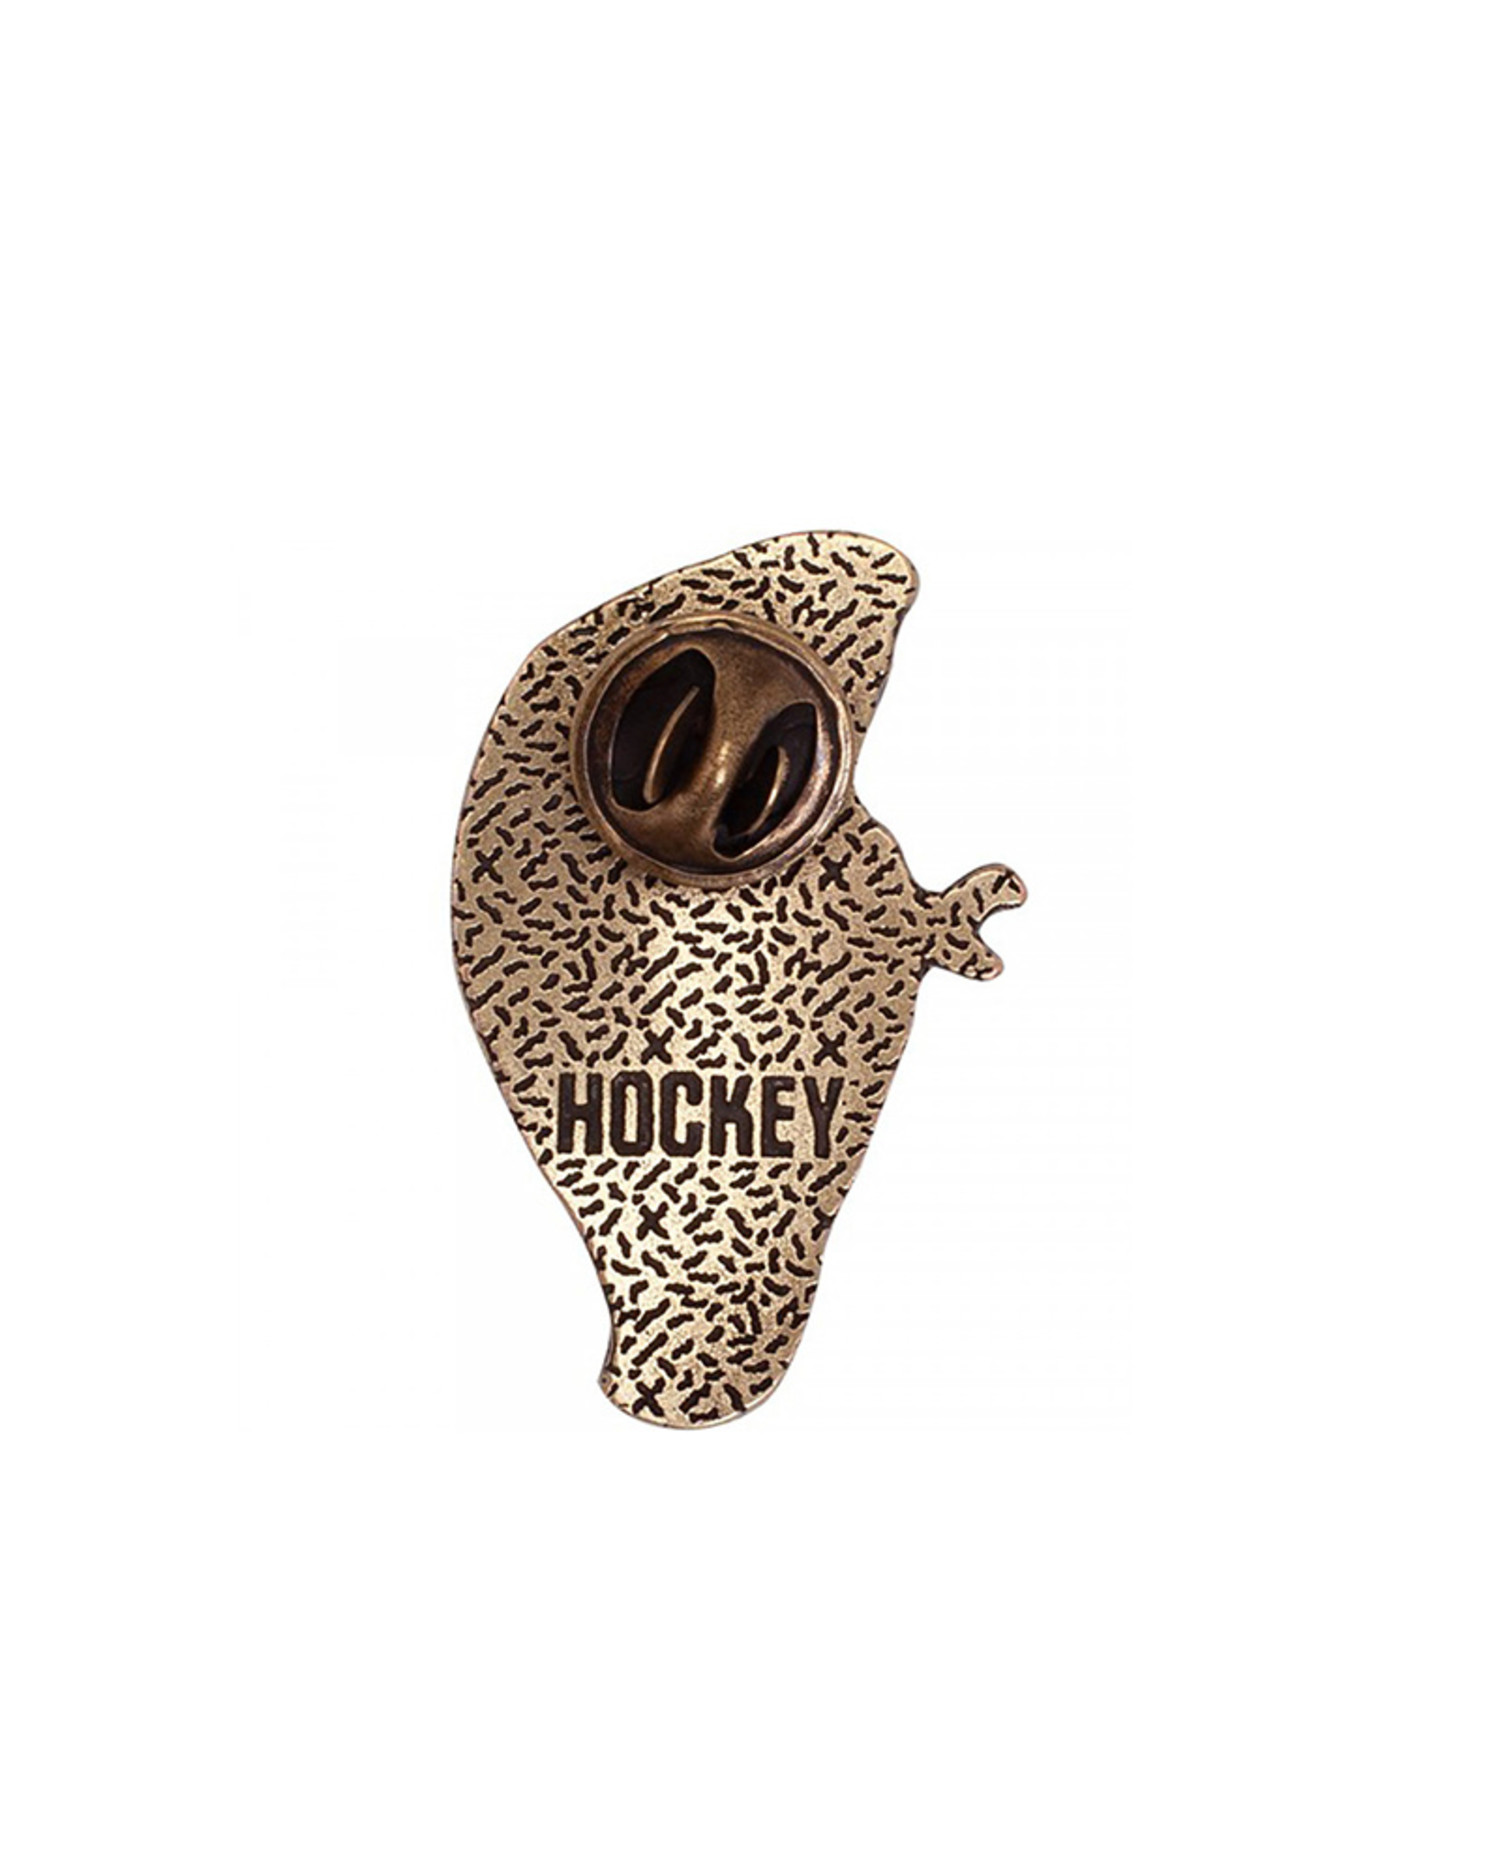 Hockey Snake Pin